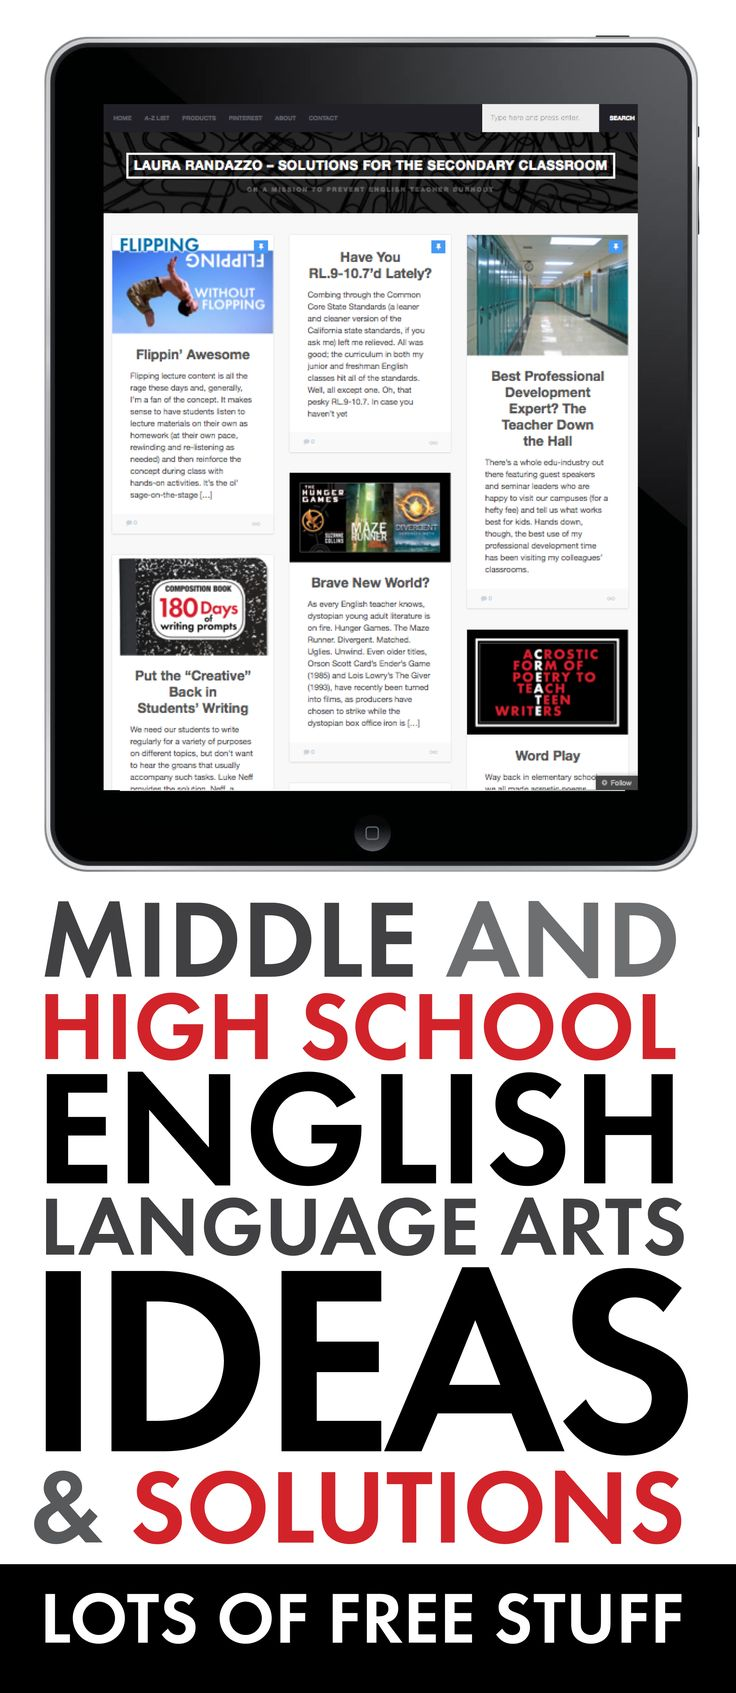 Fresh ideas to add to your English/Language Arts classroom. #highschoolEnglish #middleschoolEnglish